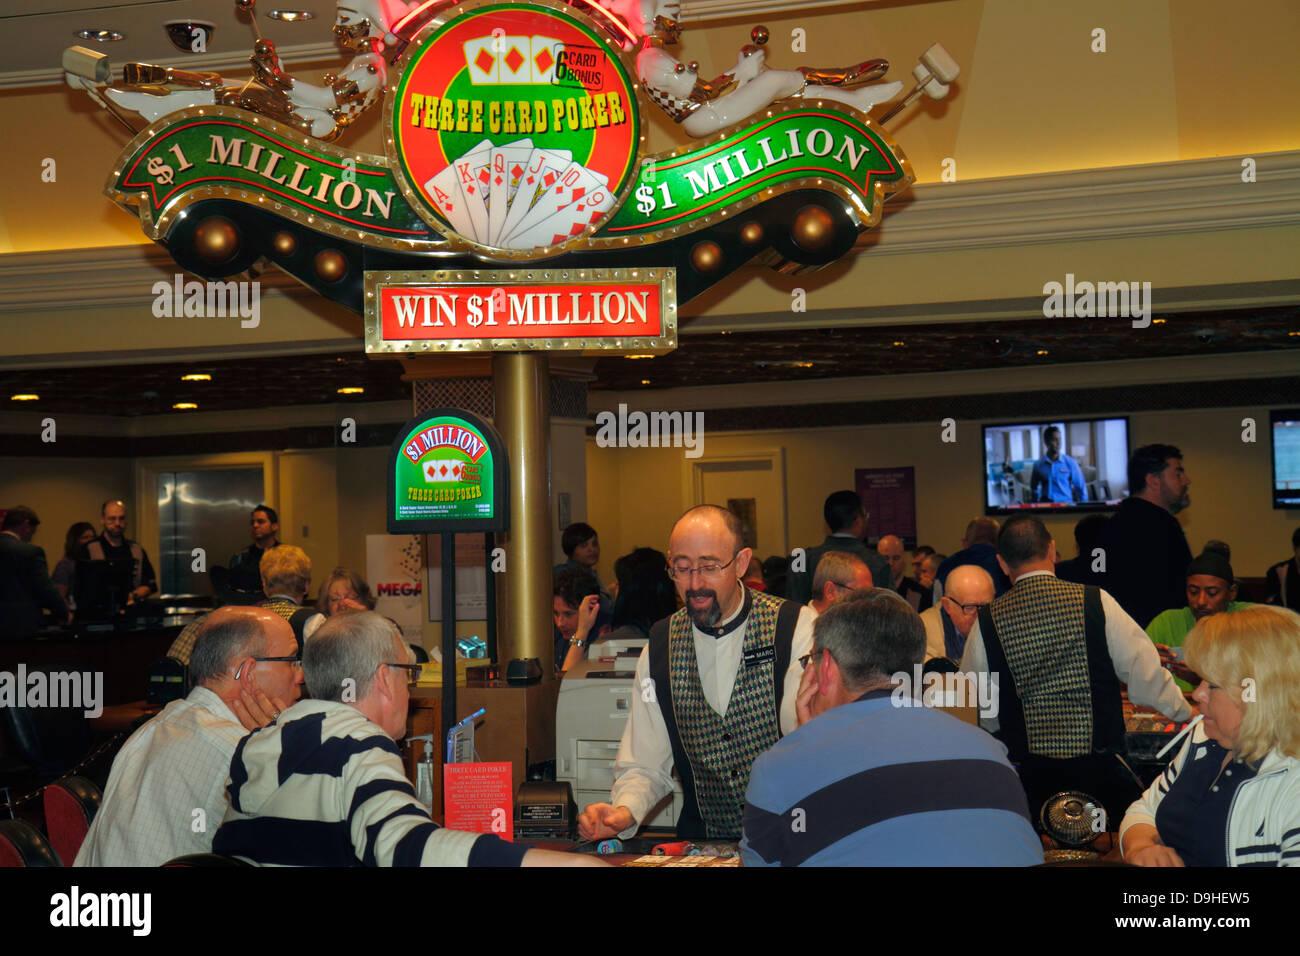 Casino harrahs las nv vegas statistics approach to gambling